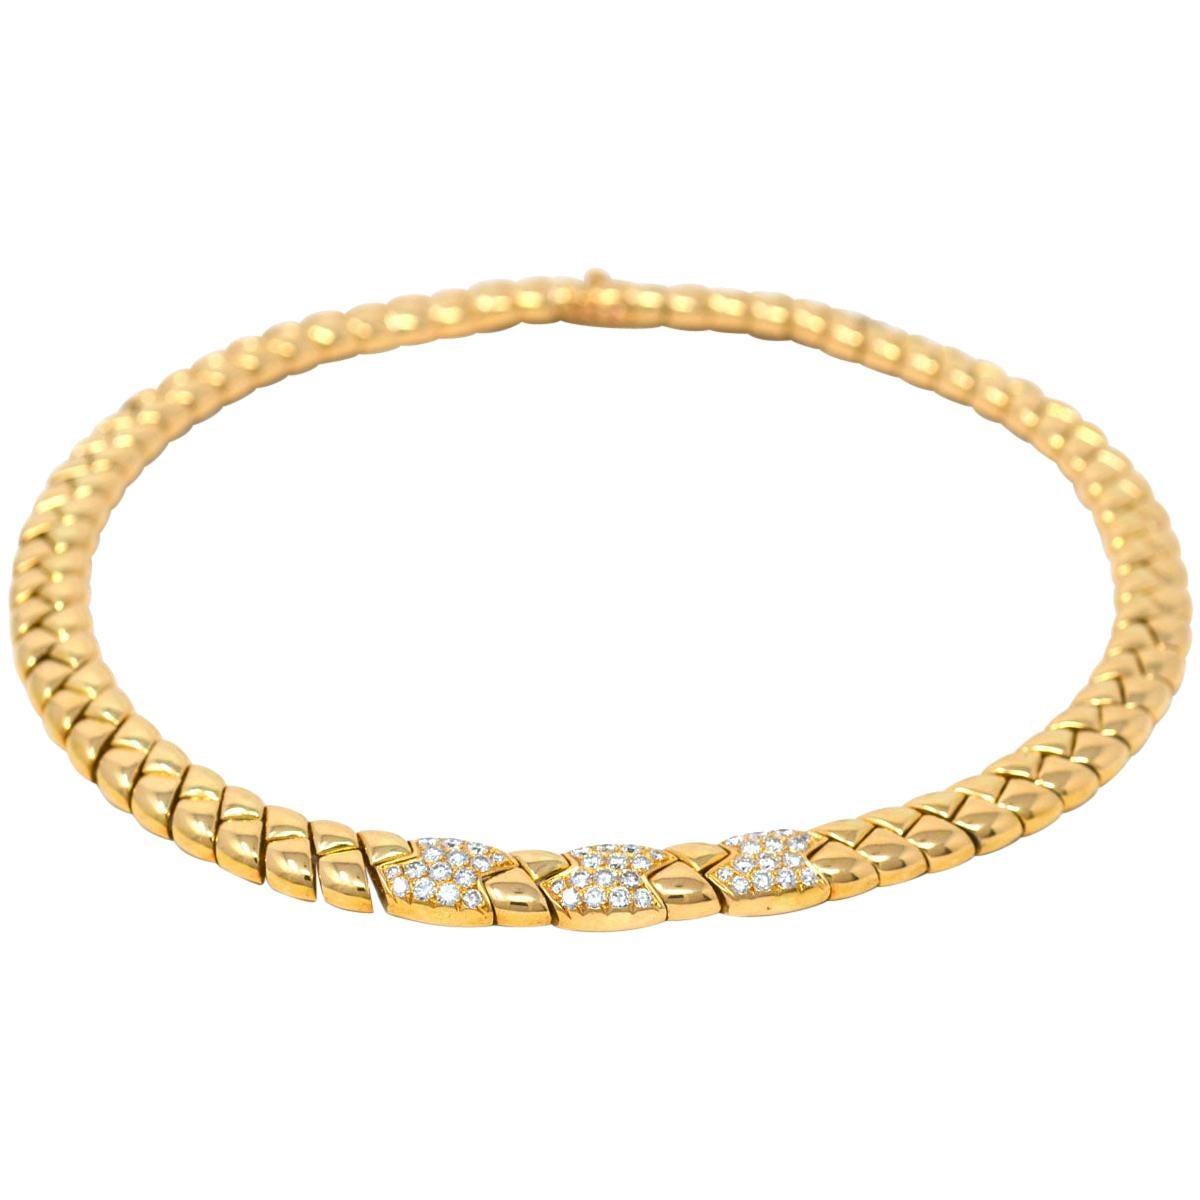 Van Cleef & Arpels 18 Karat Yellow Gold Vintage Diamond Choker Necklace